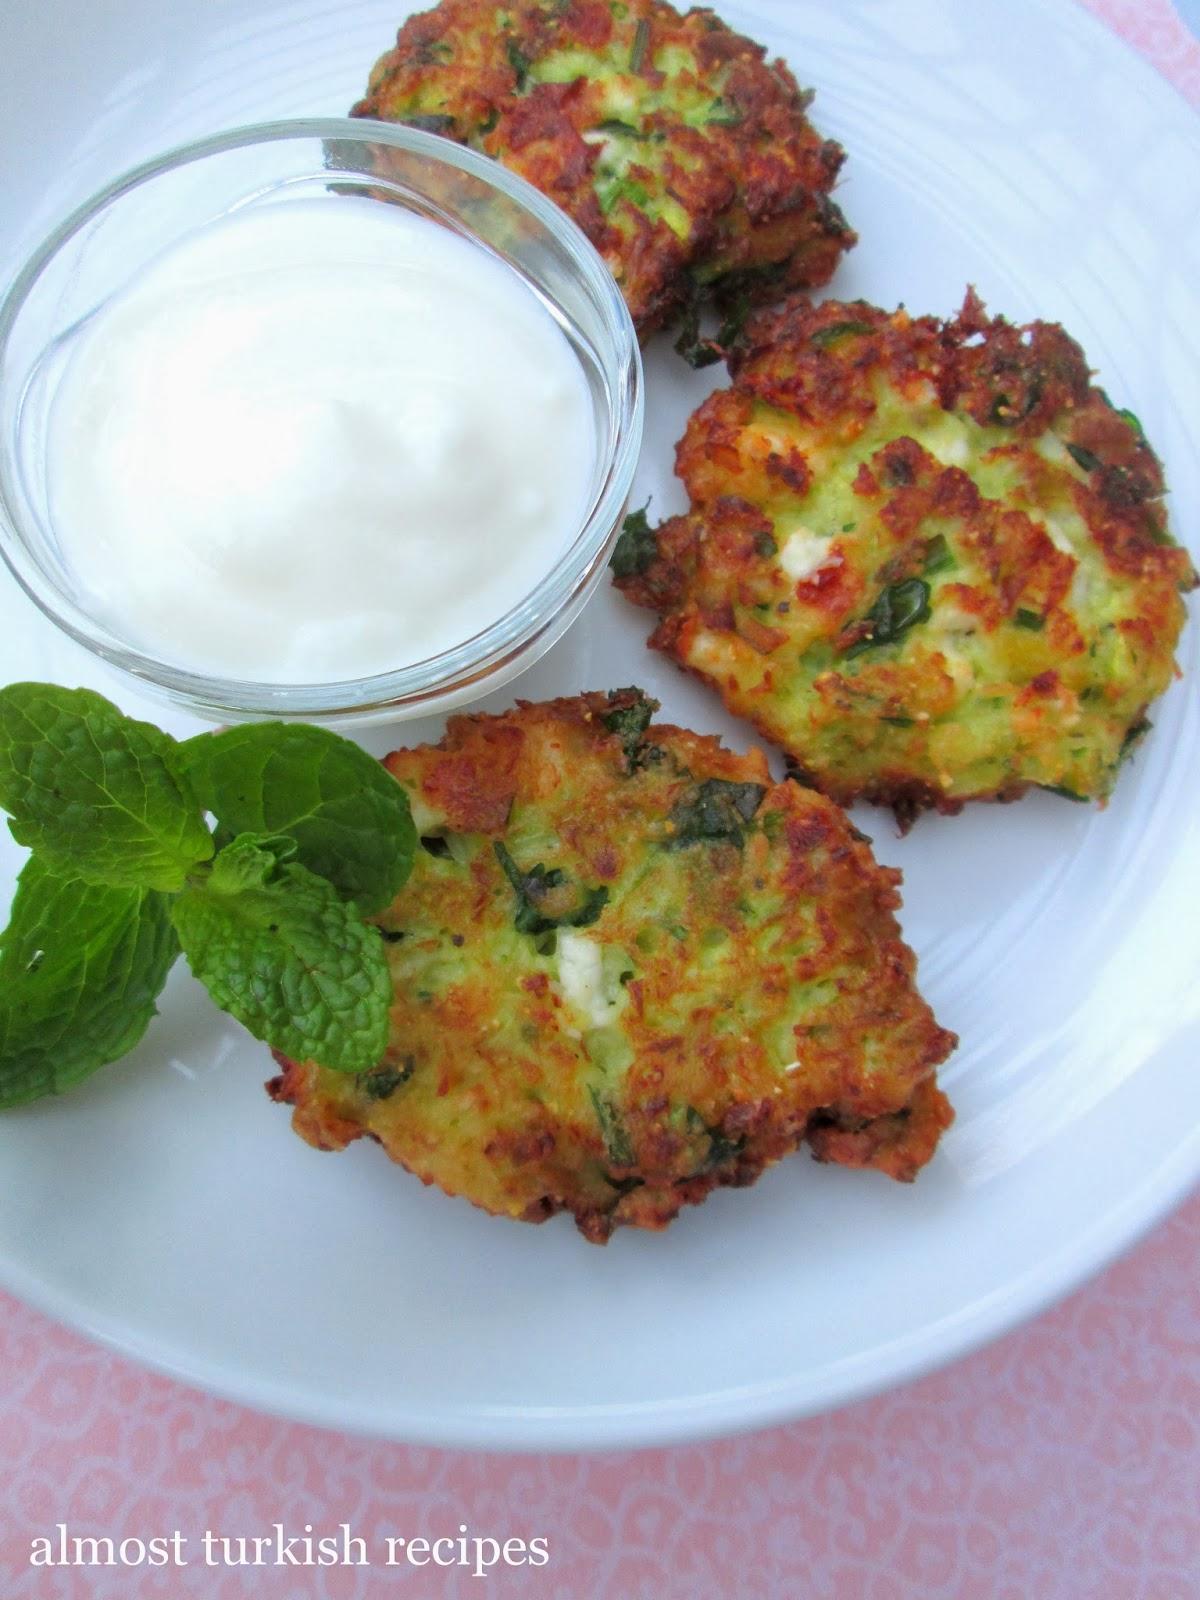 Leek Fritters (Pırasa Mücveri) - Turkey Cuisine Recipe